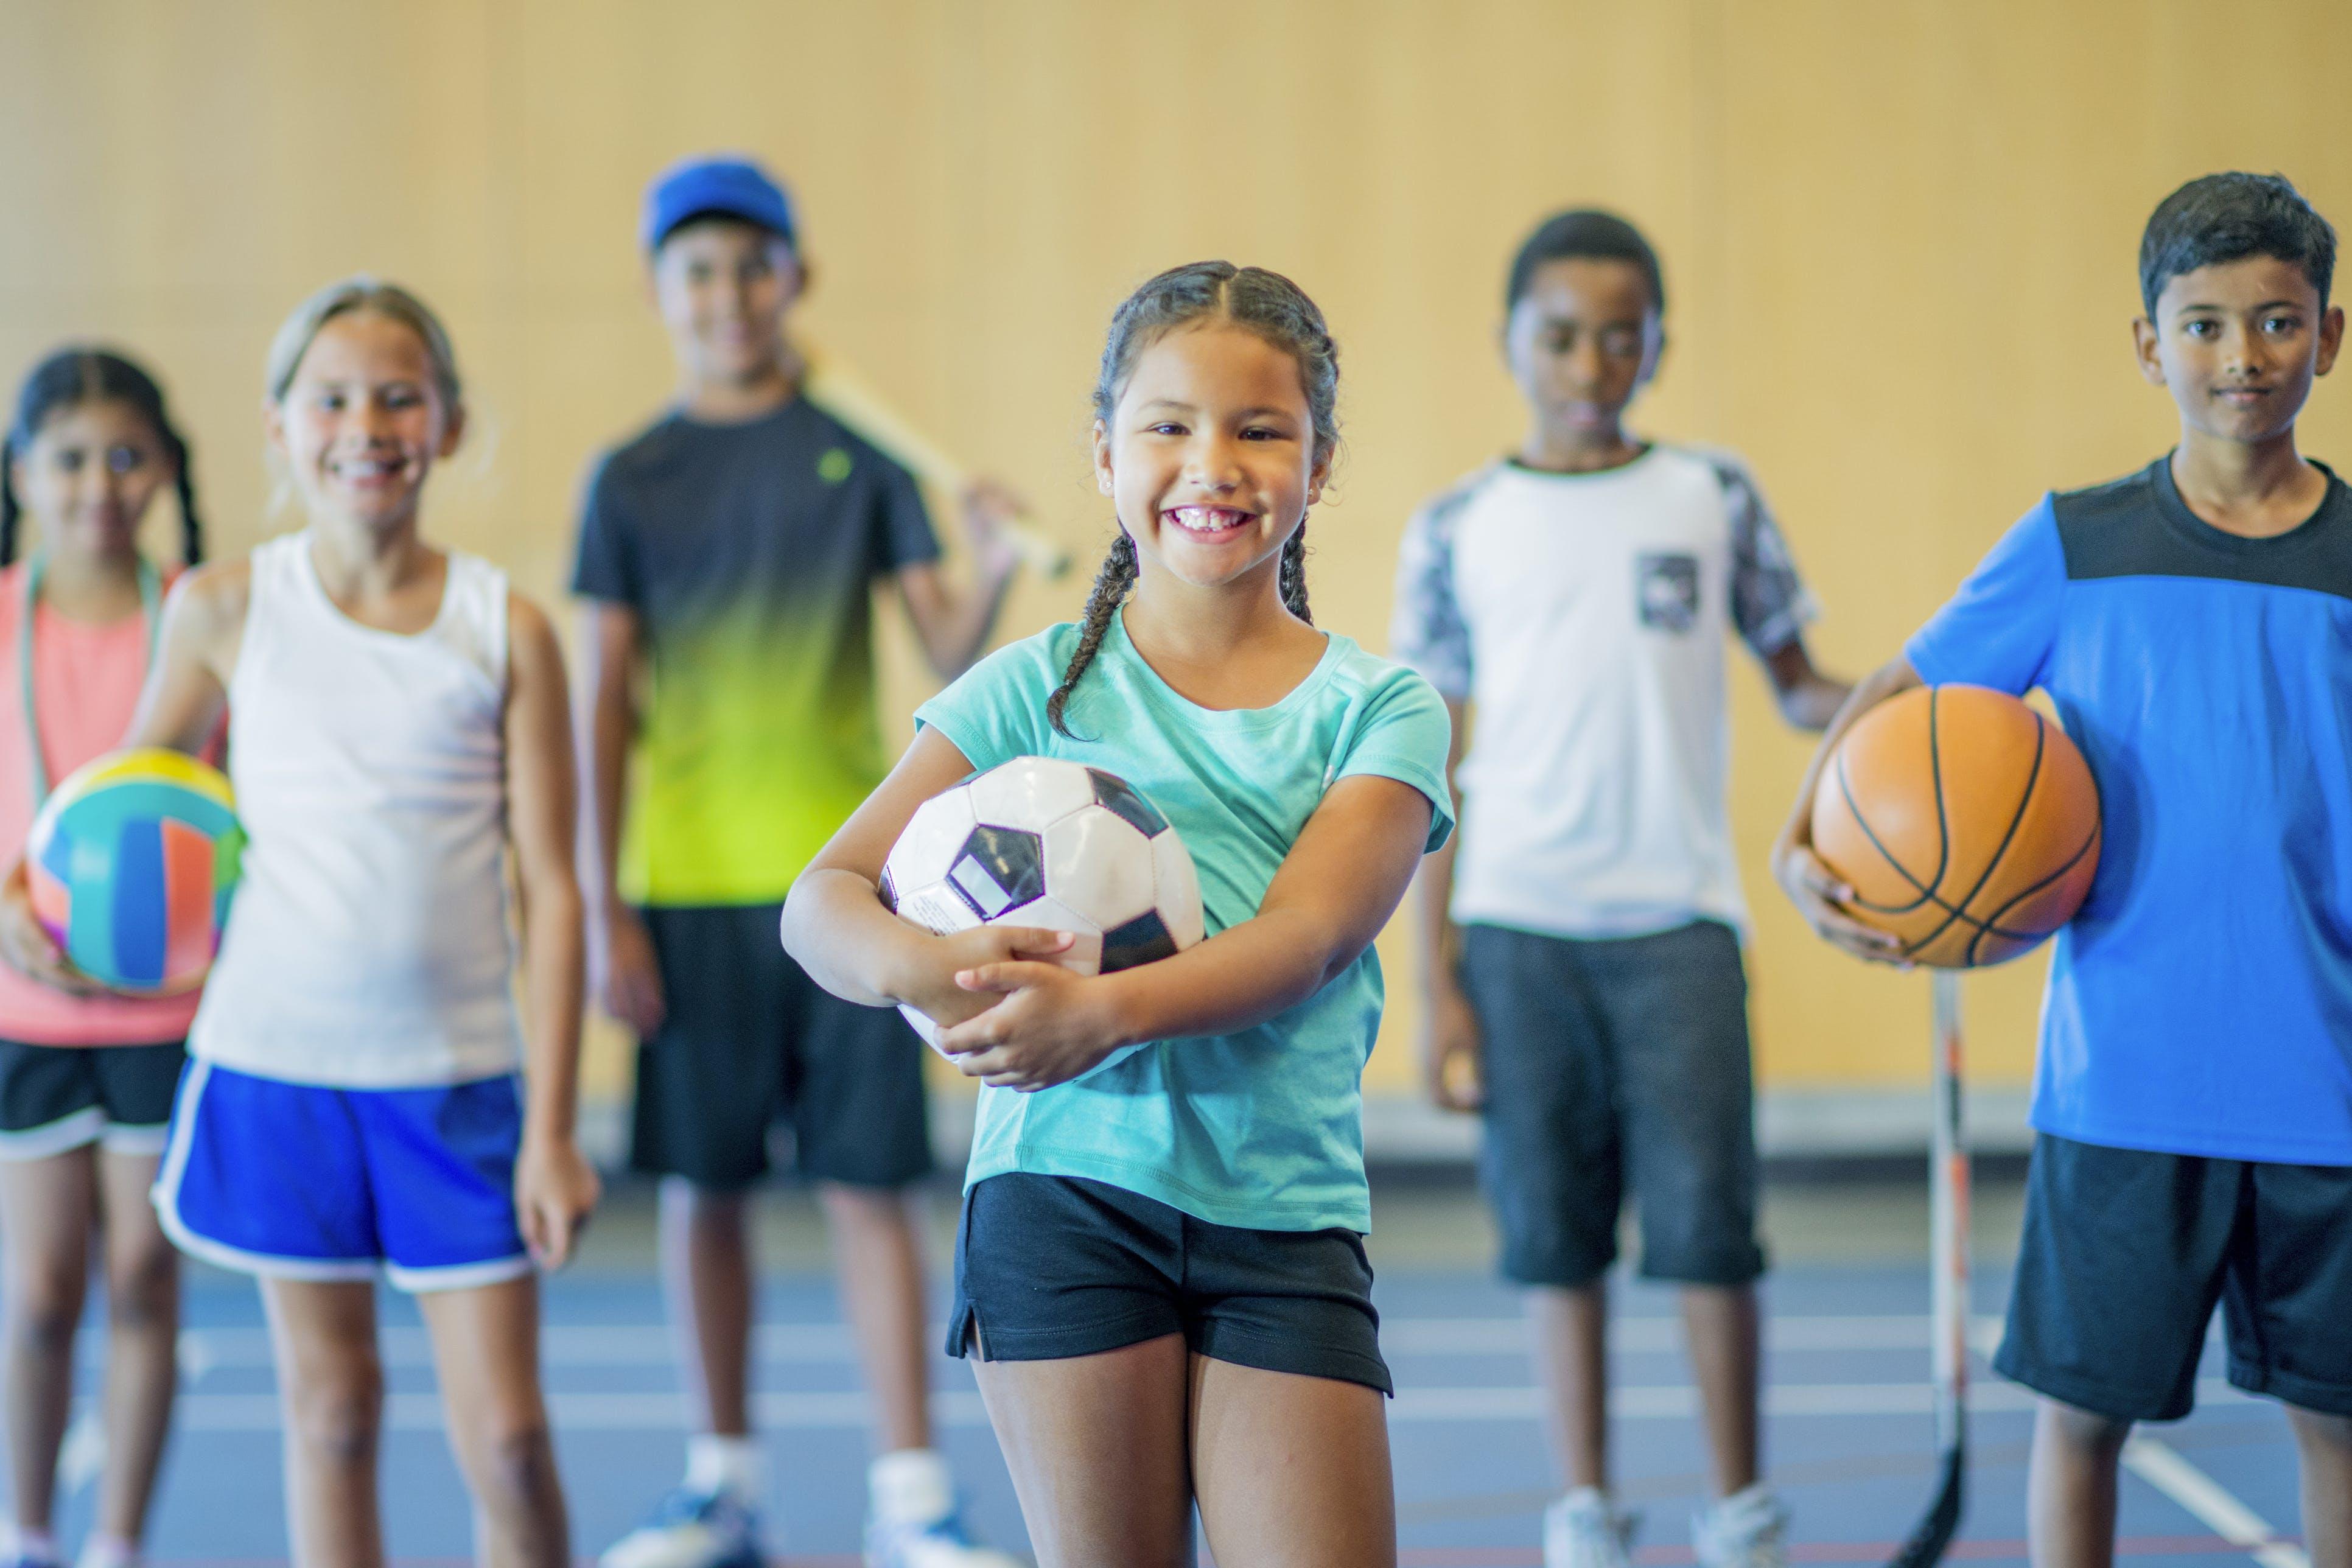 Kids happy to play sports